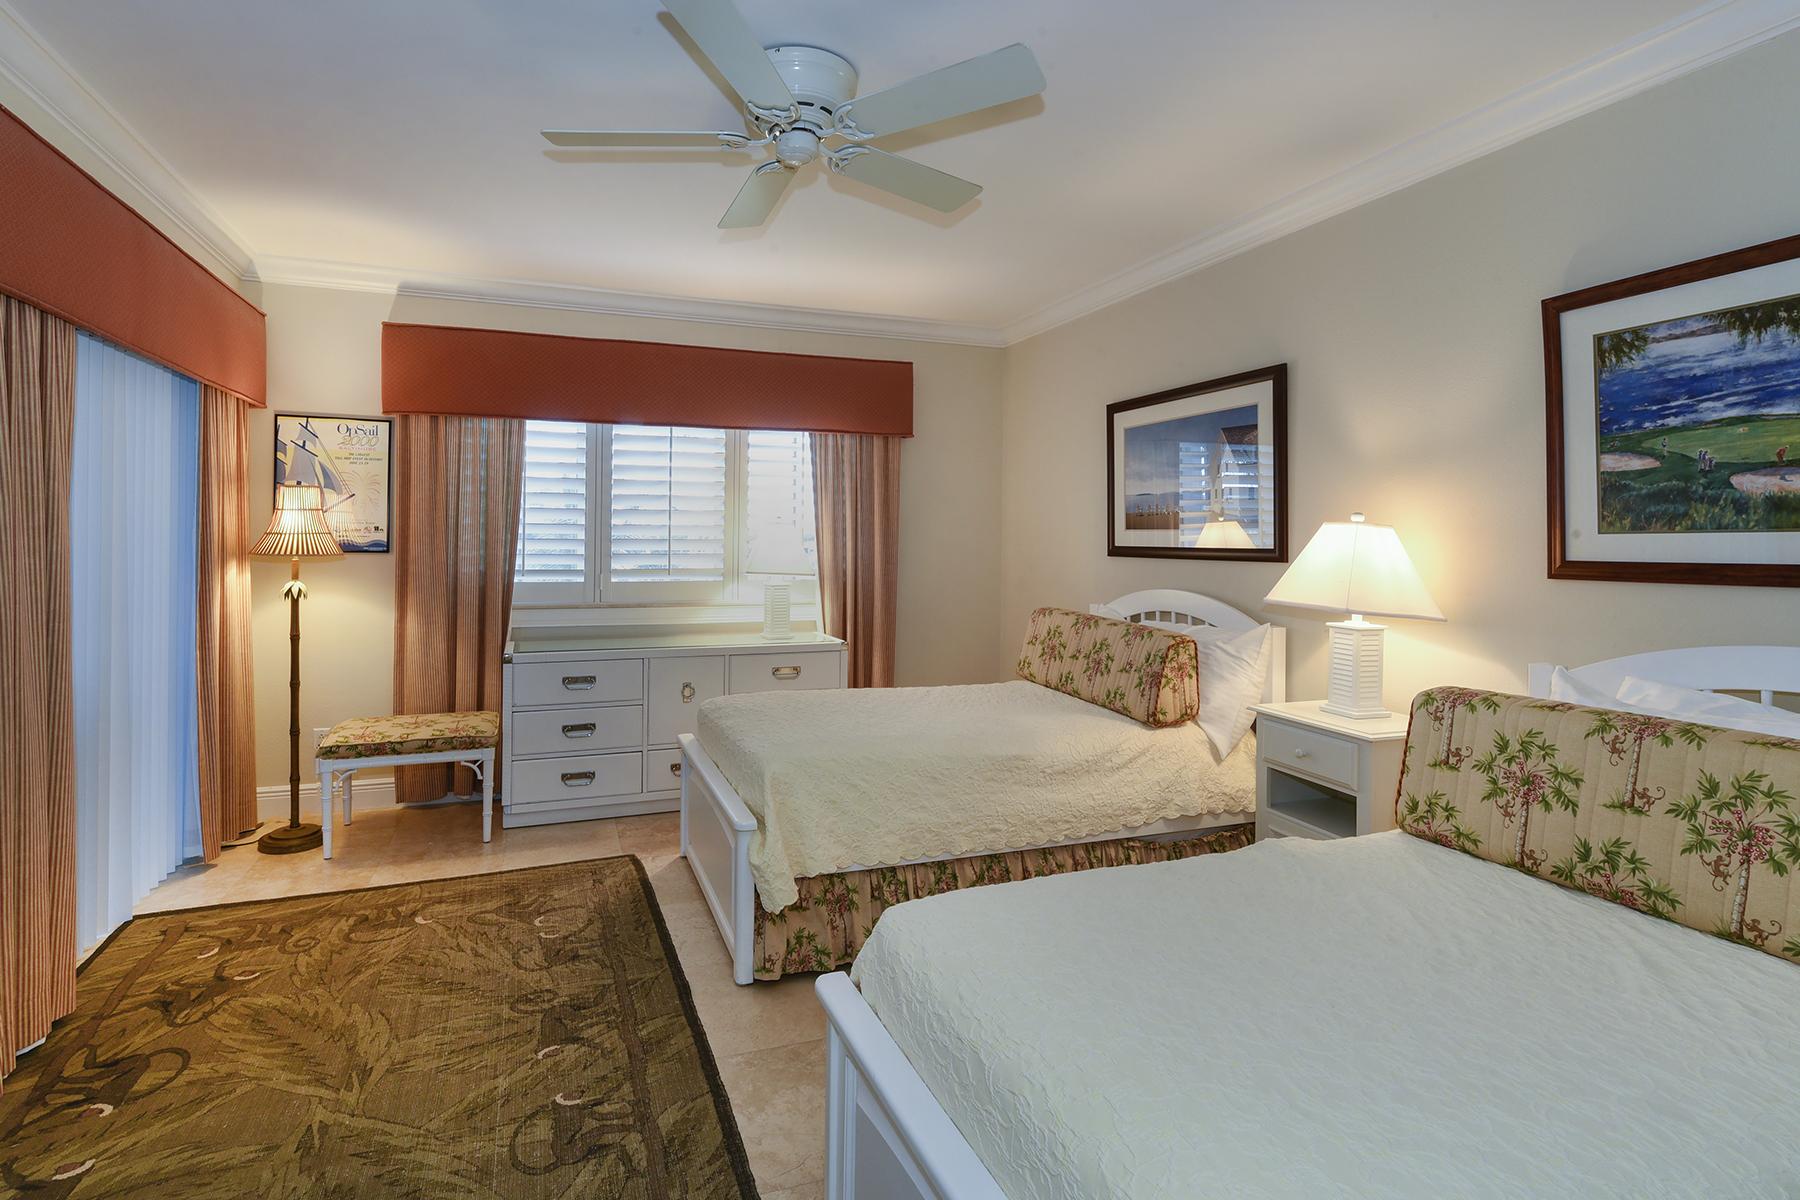 Additional photo for property listing at Marina Village Living at Ocean Reef 17 Marina Drive, Unit A Key Largo, Florida 33037 Estados Unidos